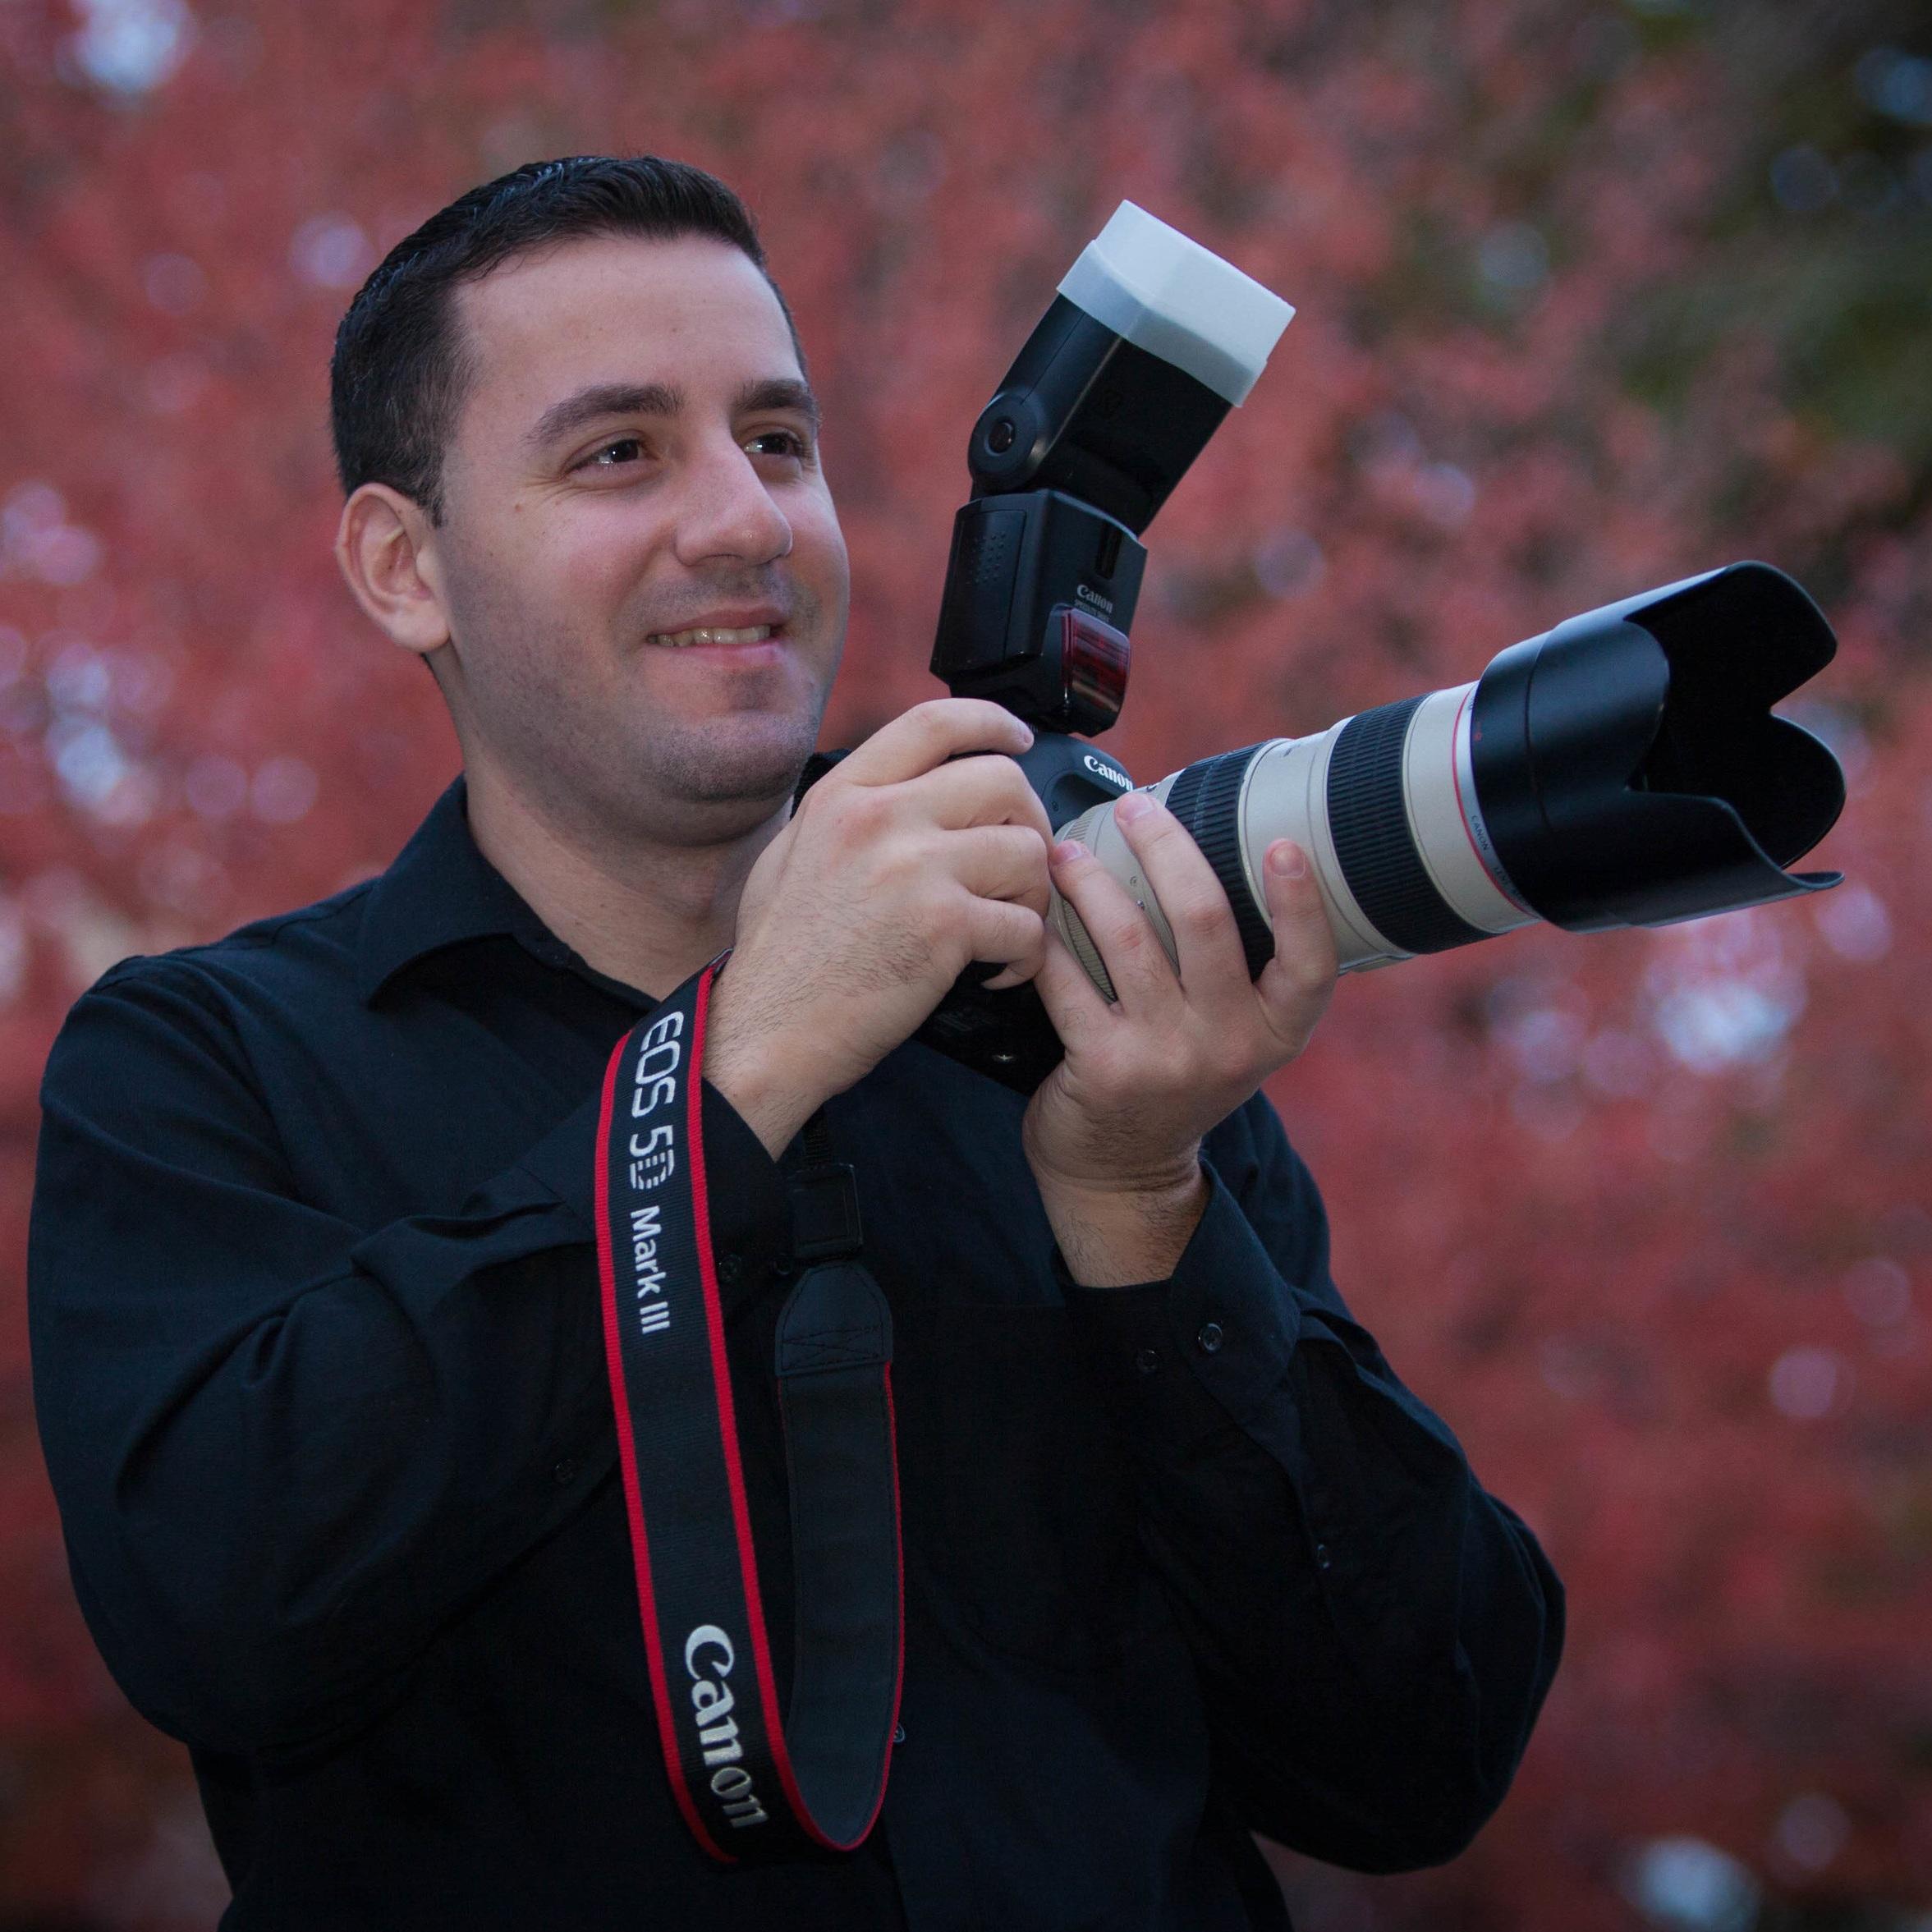 SALVATORE GRAFFEO   PHOTOGRAPHER